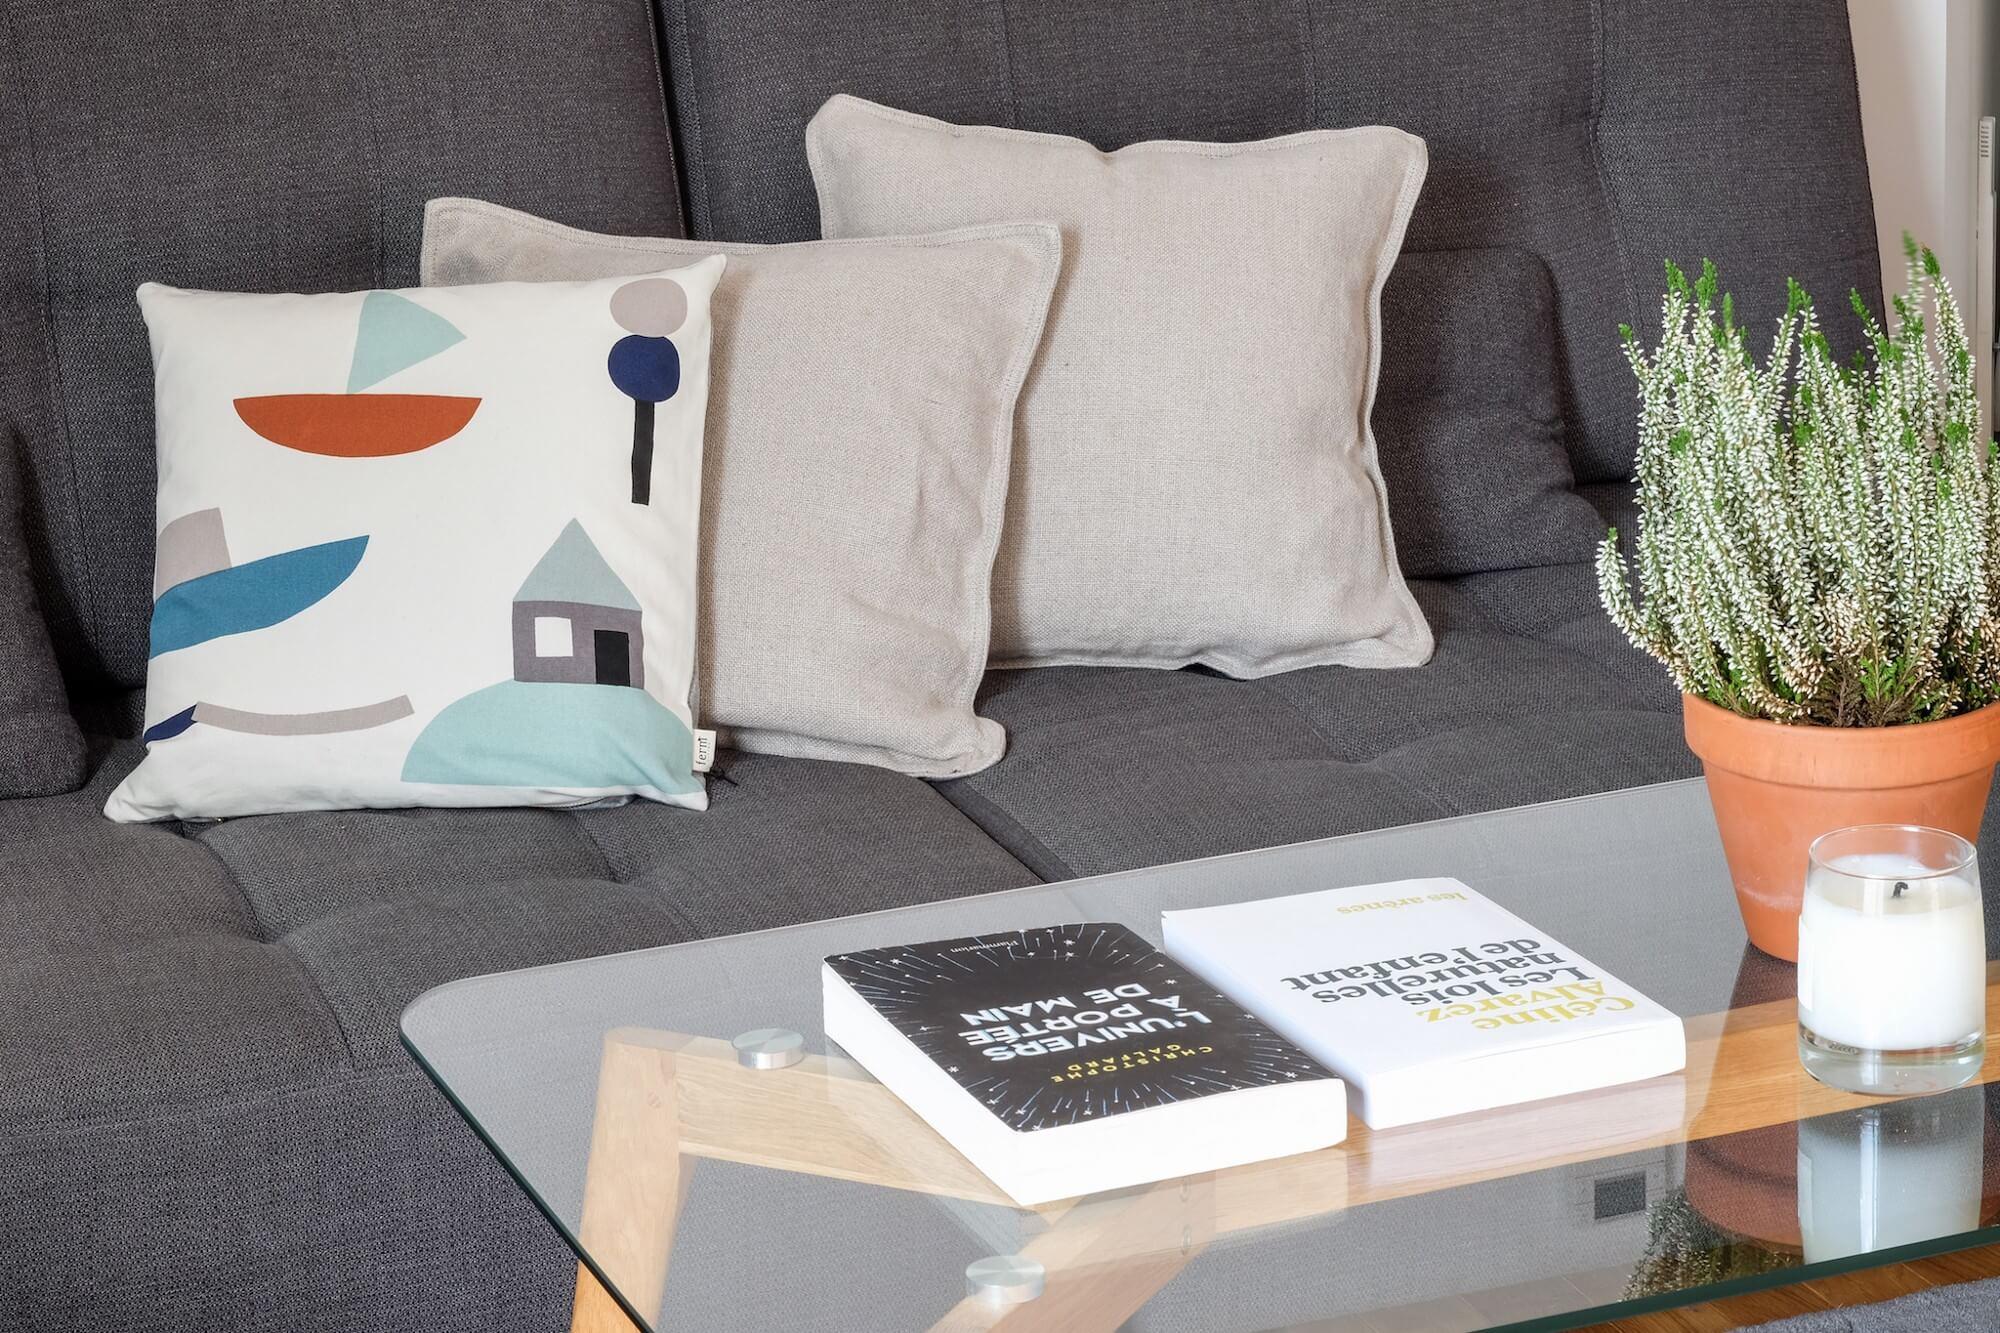 bumper-blog-news-immobilier-lyon-appartement-vente-achat-investir-homestaging-design-decoration-lifestyle-art3.jpg